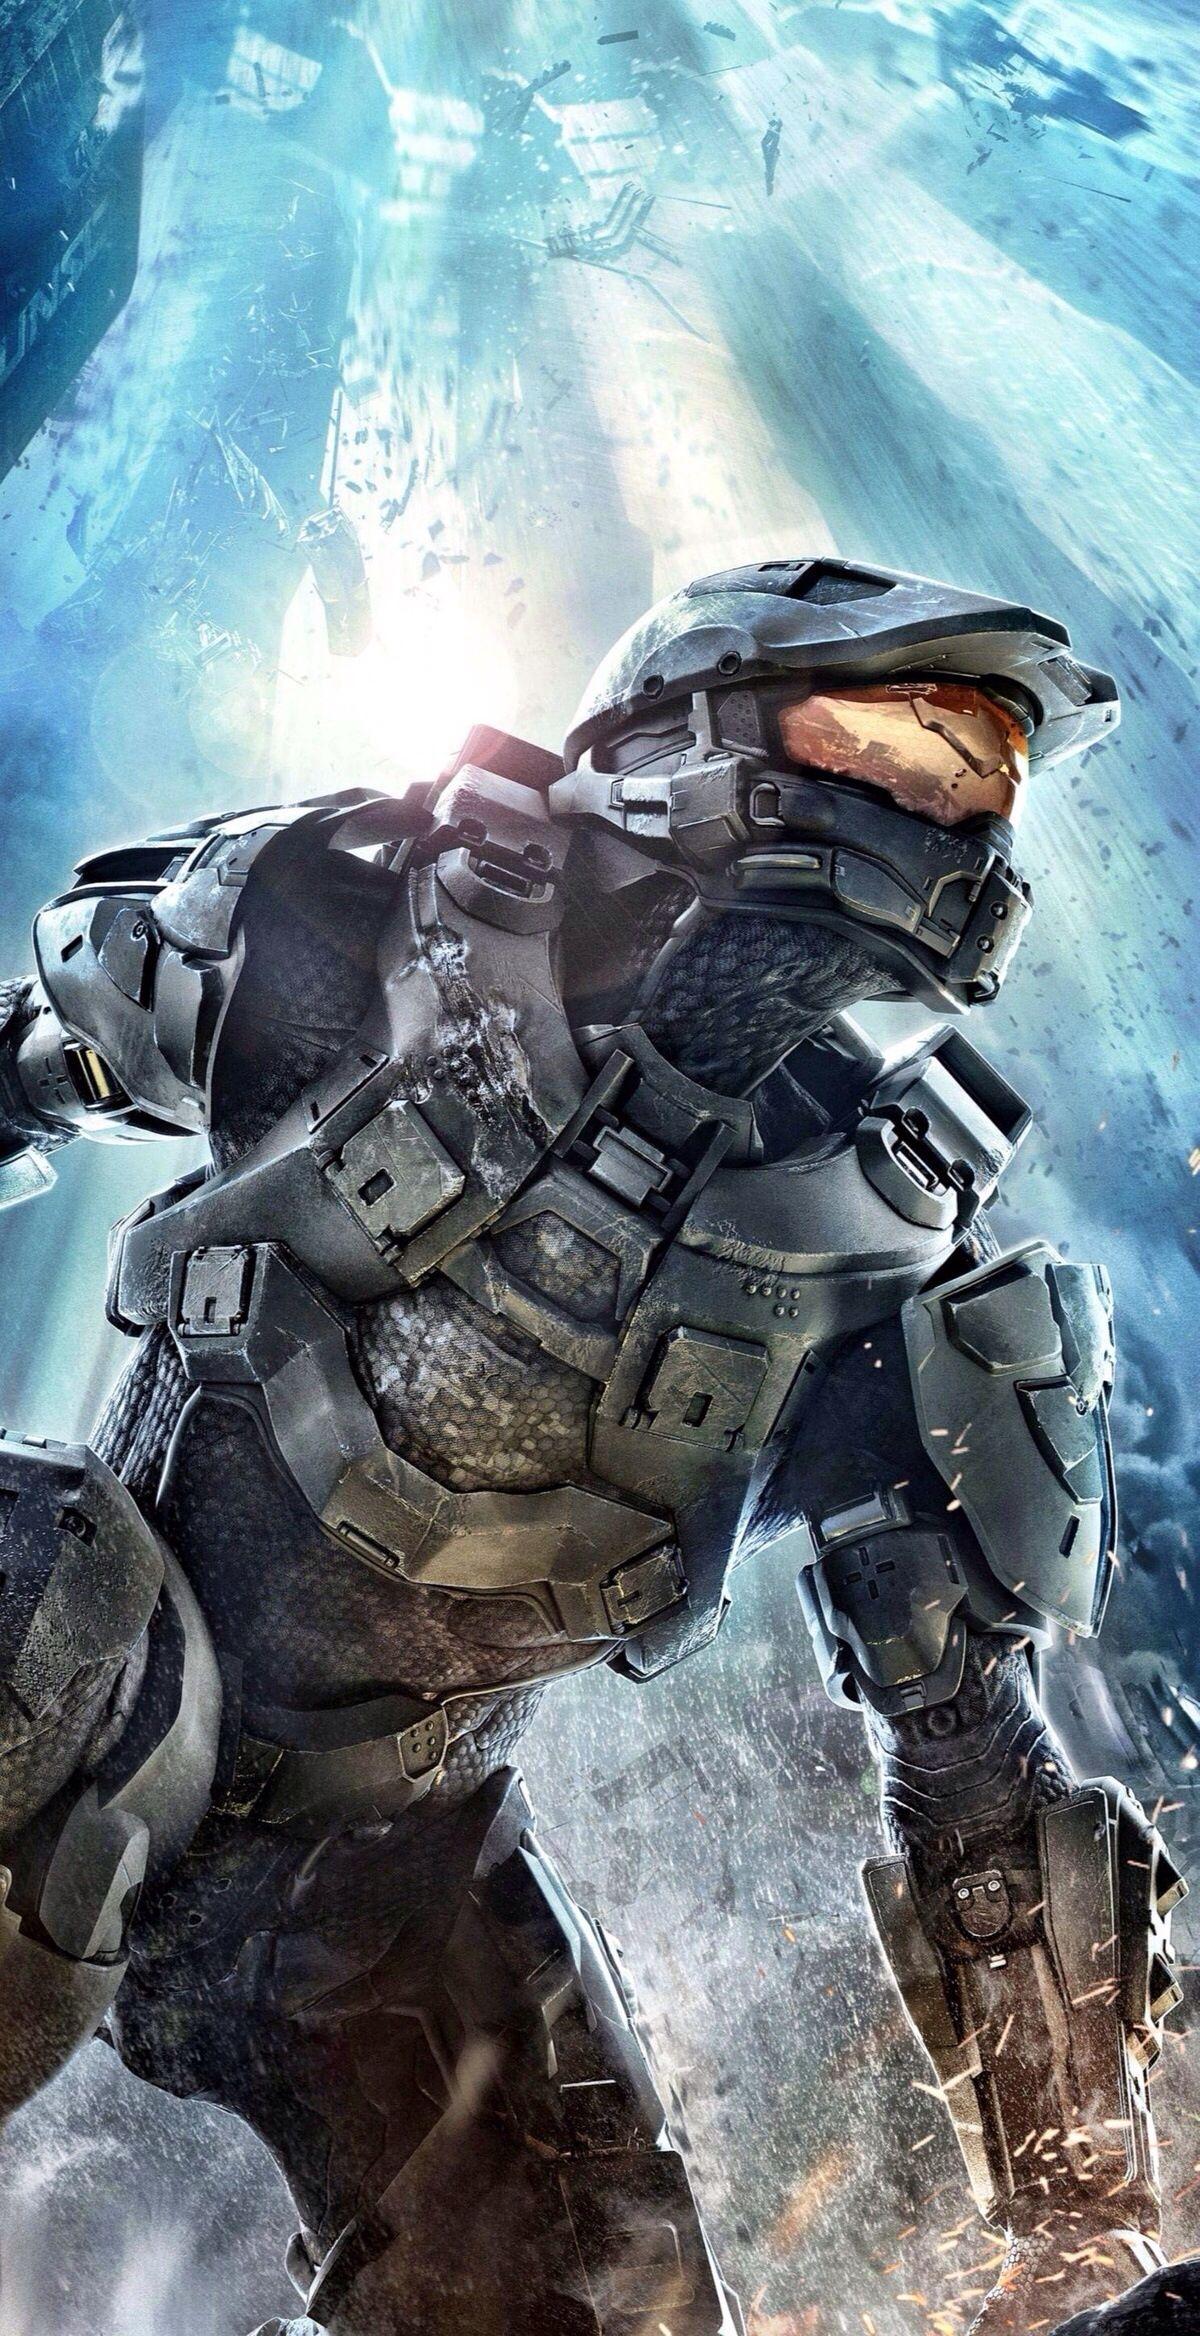 Halo 4 Iphone Wallpaper Halo Reach Xbox One Futurizm